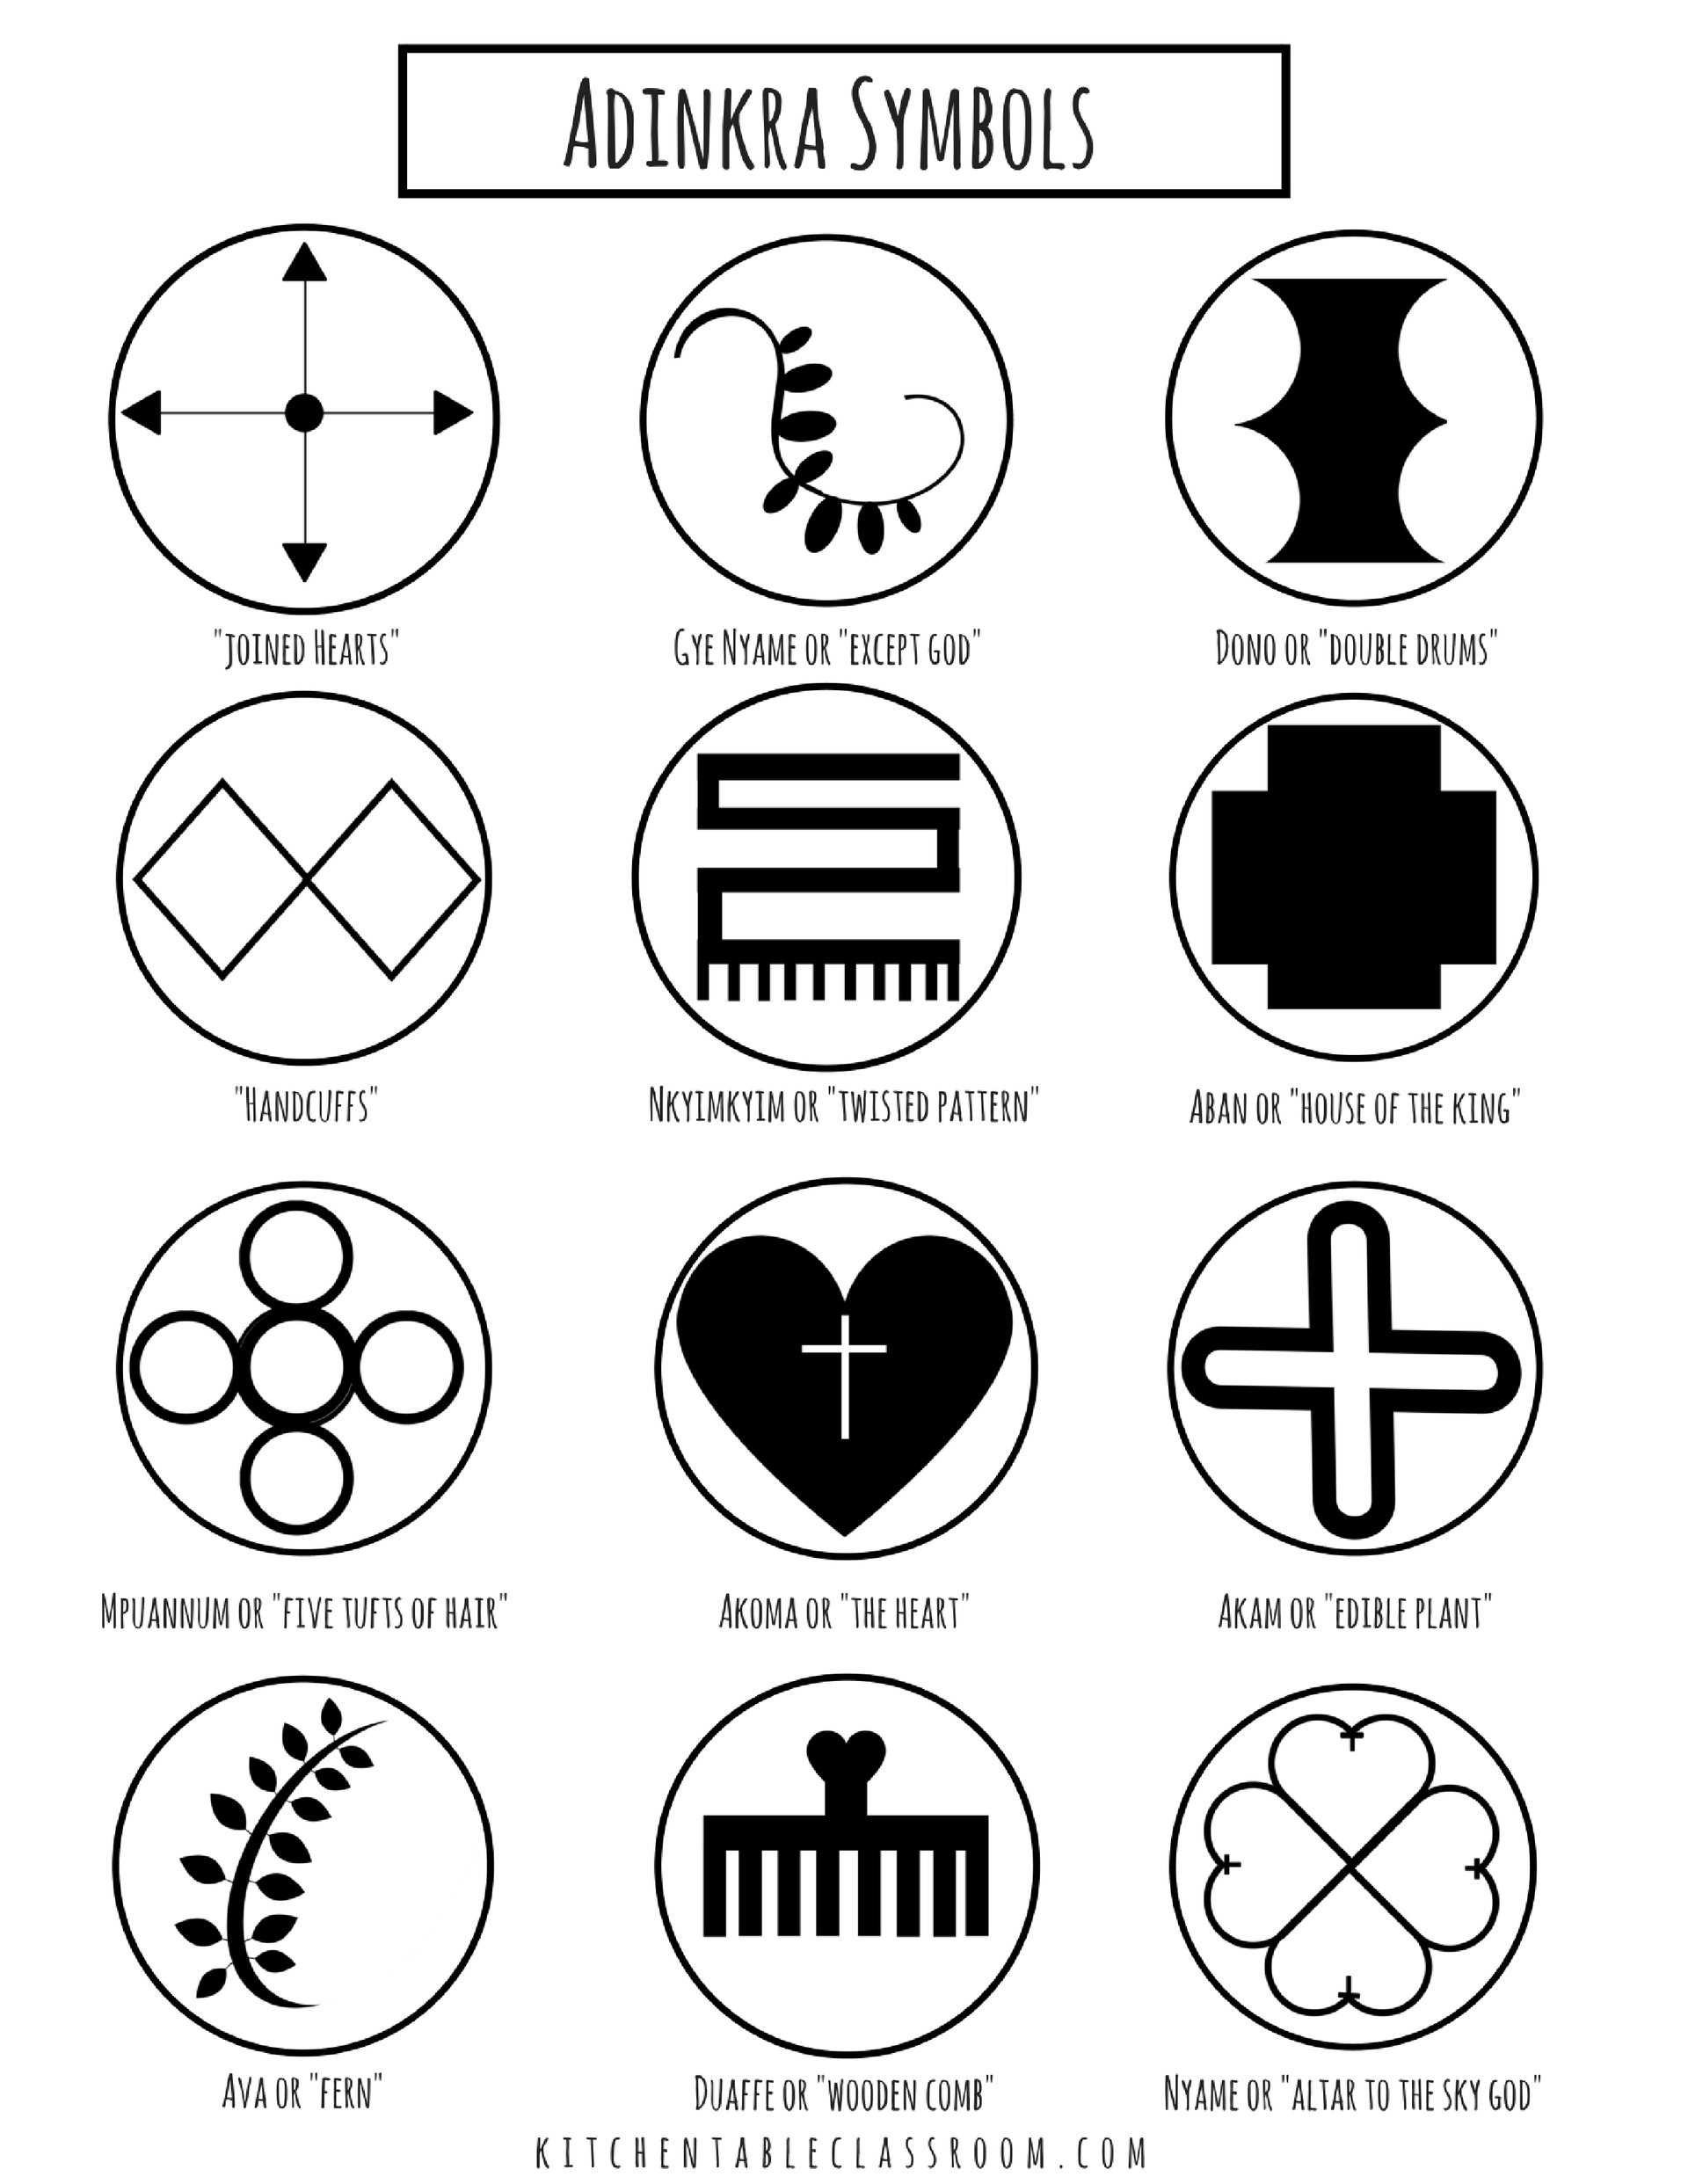 Adinkra Symbols Exploring Printmaking And Patterning